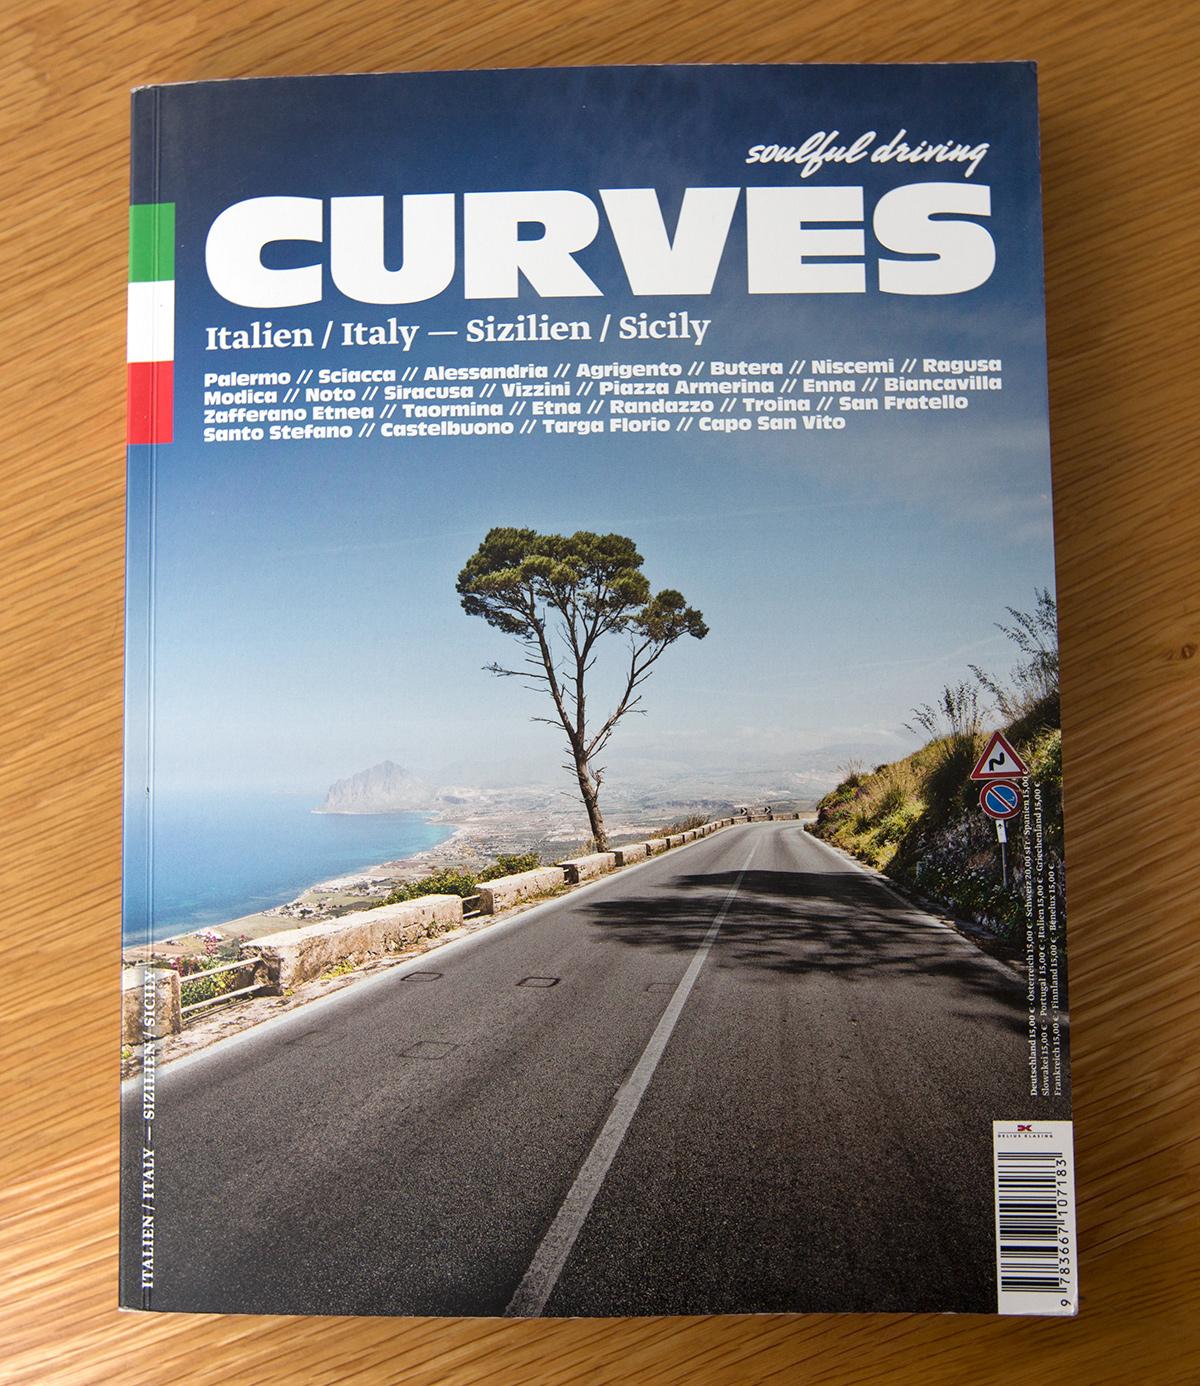 curves9.jpg